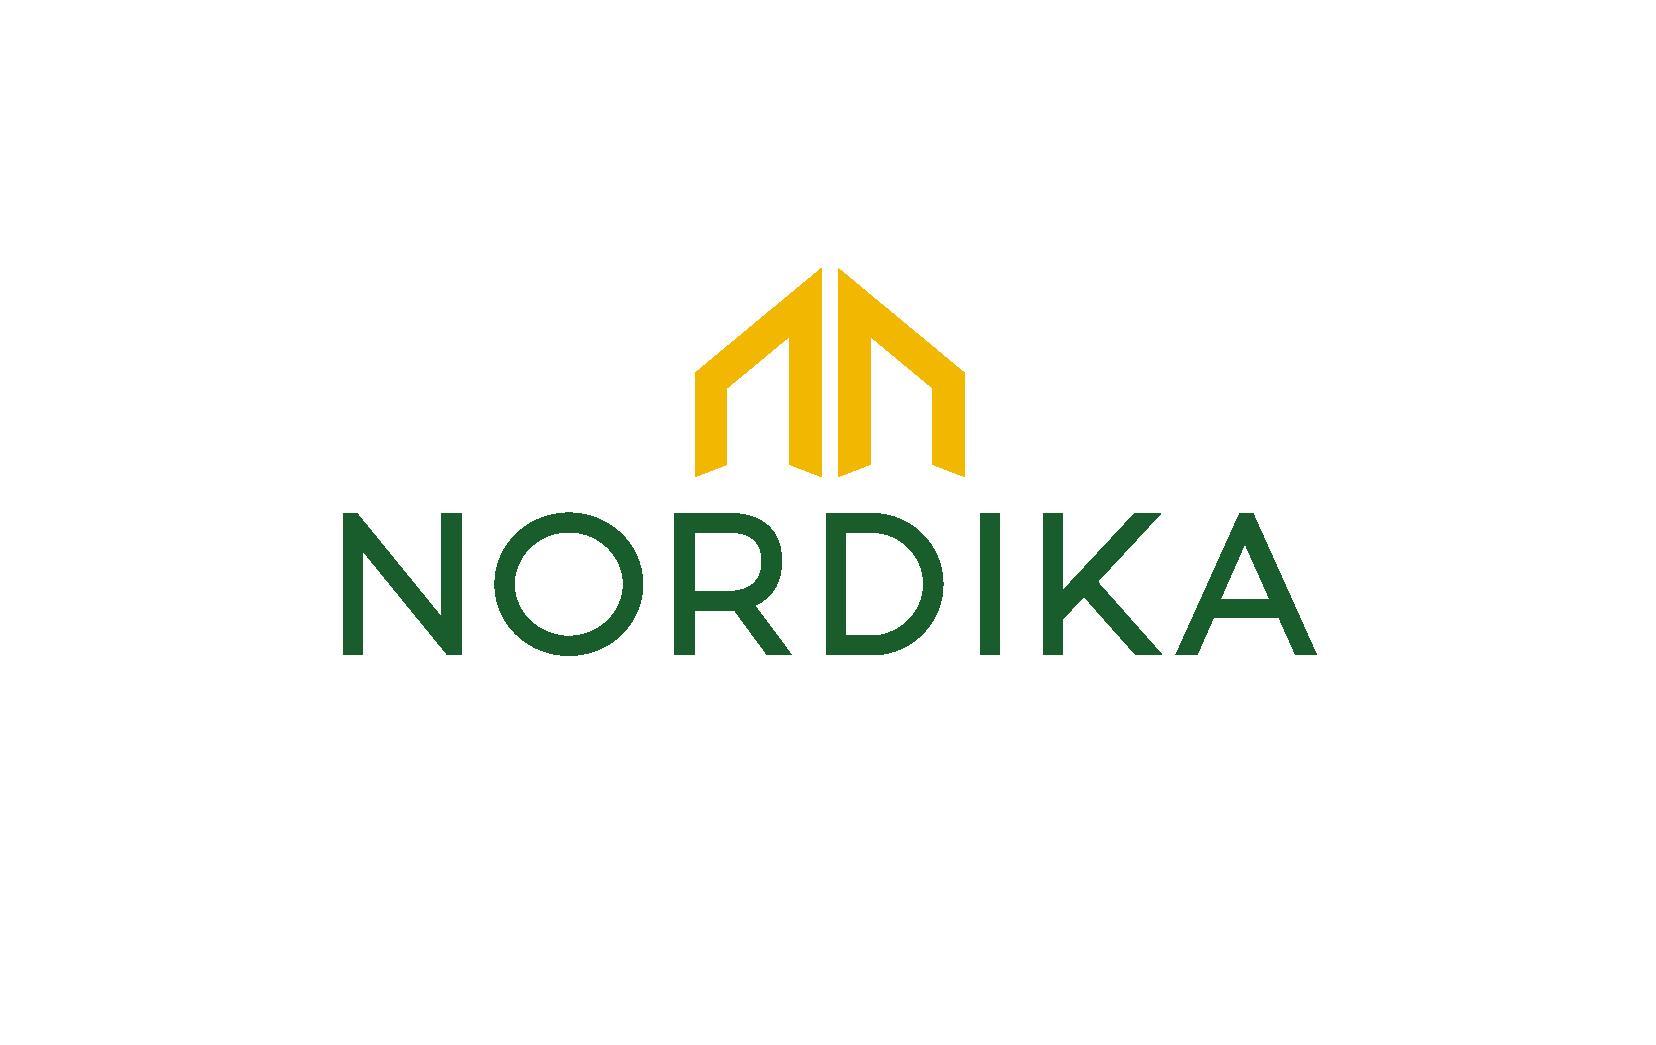 Nordika Fastigheter AB